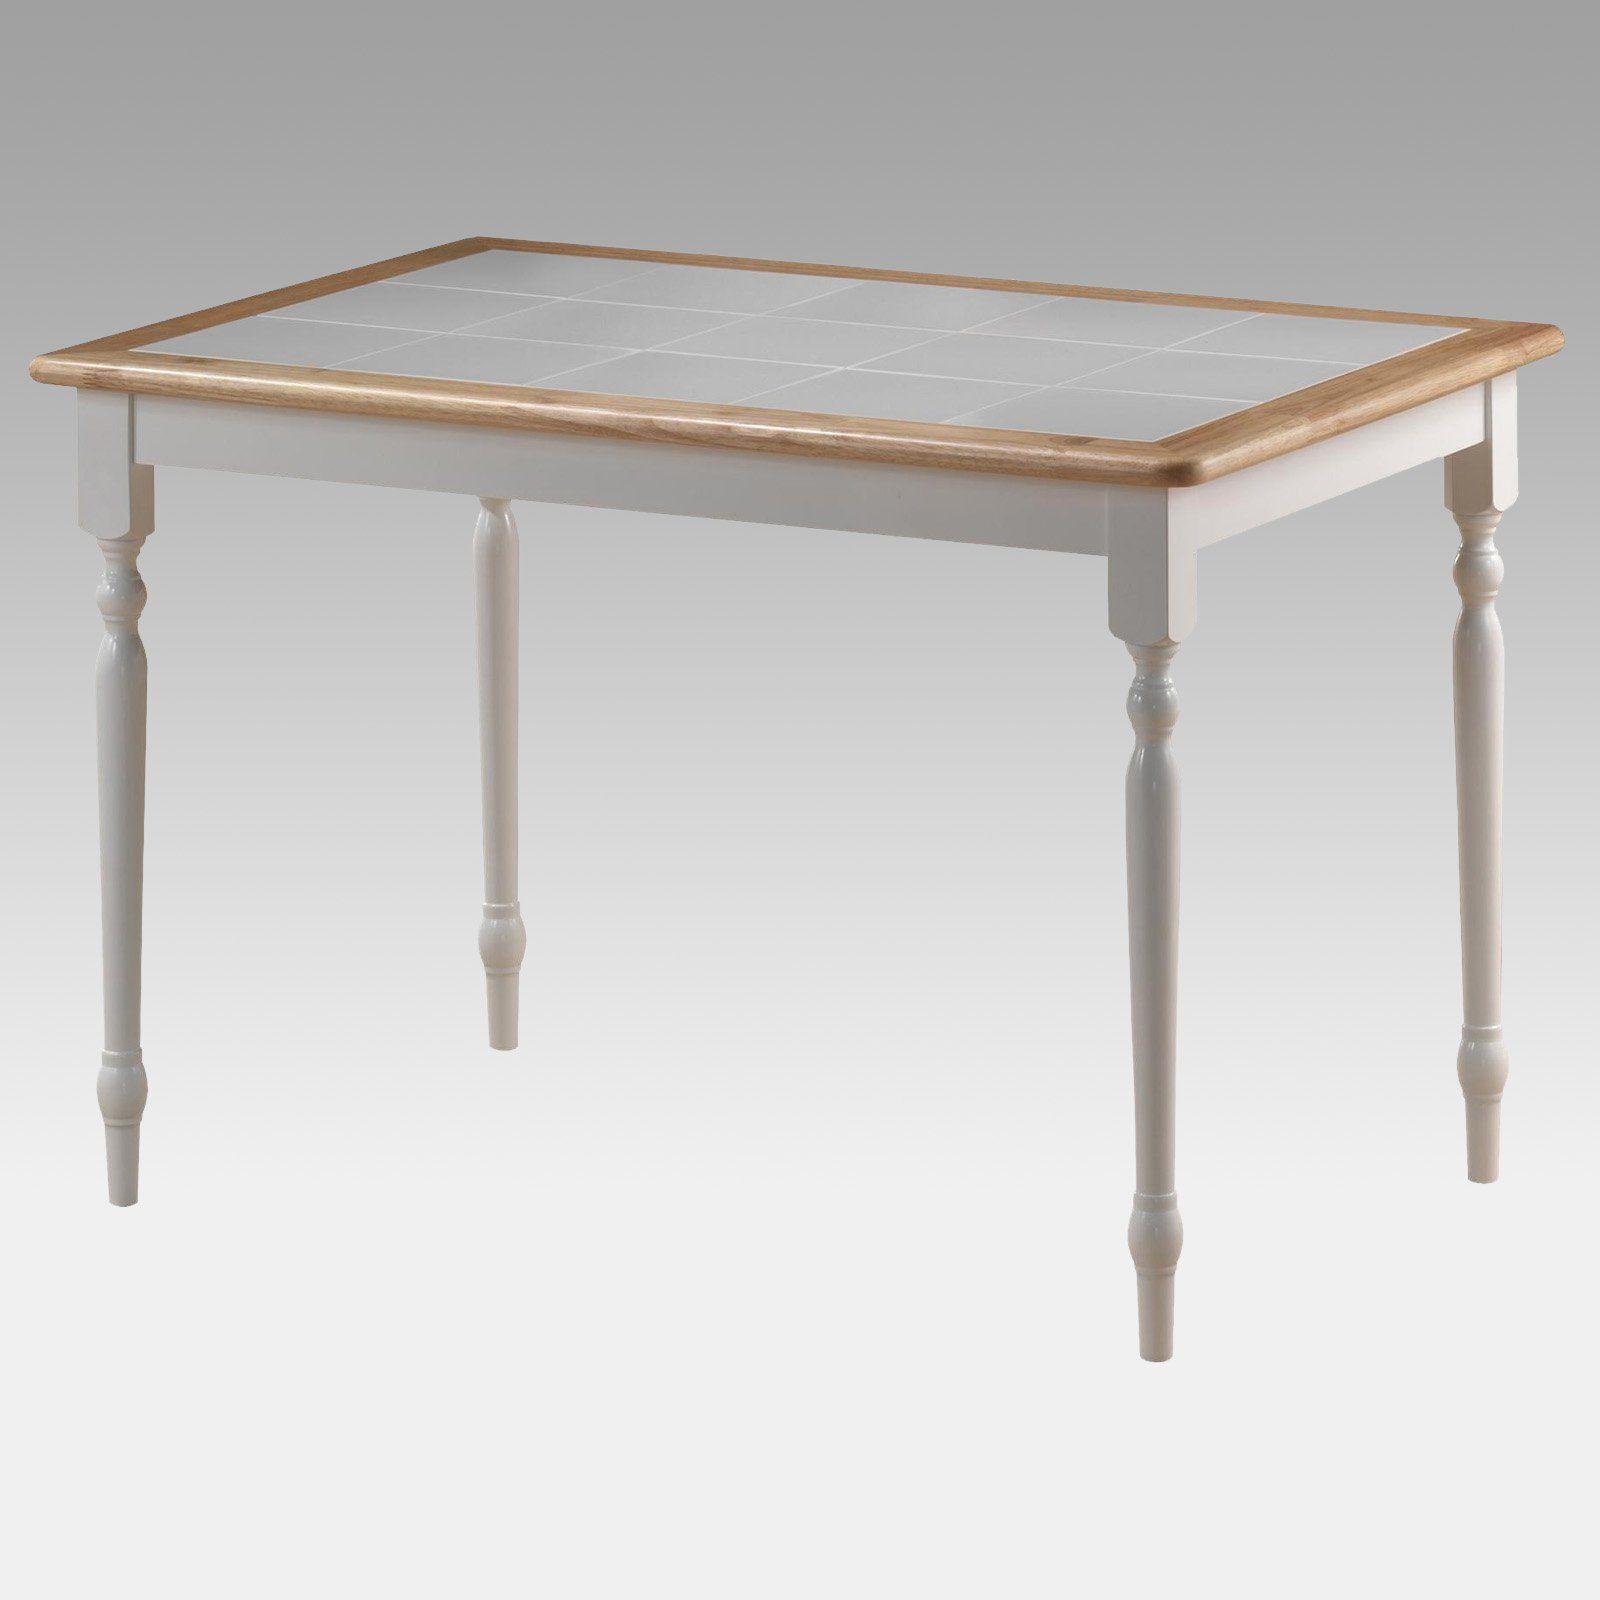 tile top dining table. Boraam Farmhouse Tile Top Rectangular Dining Table - 30 X 45 In. 70100 I